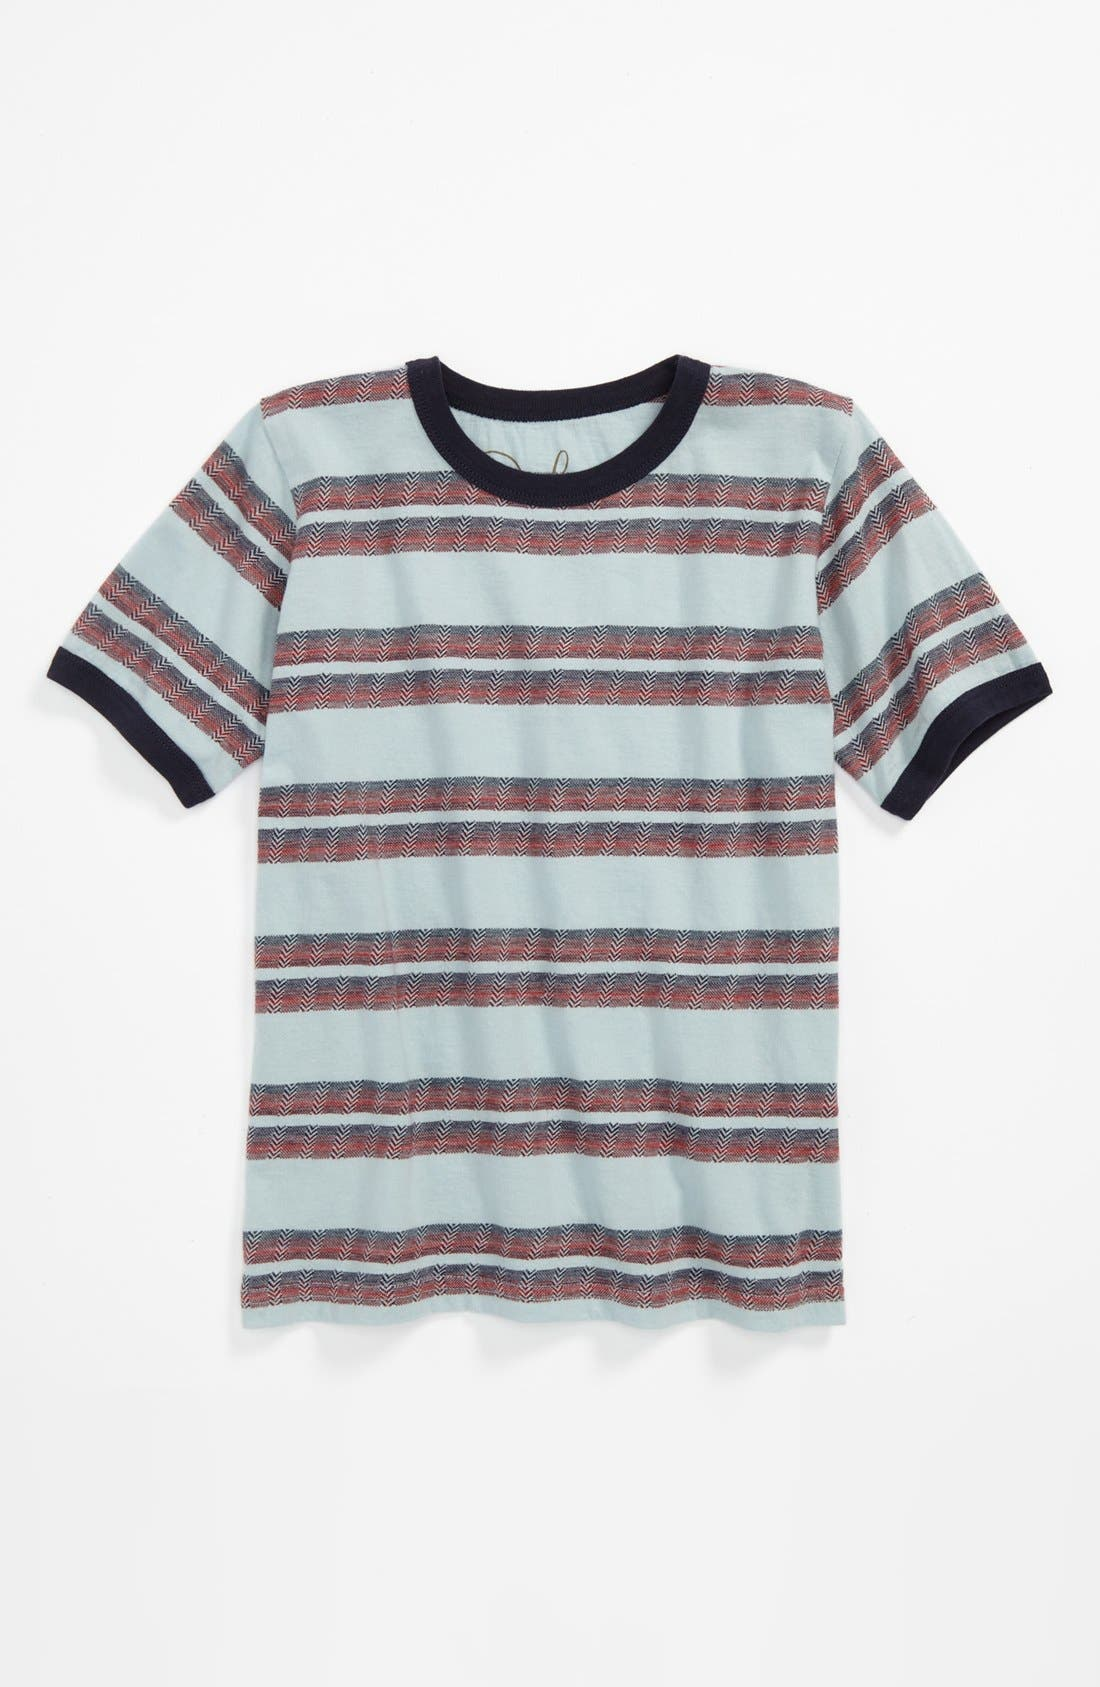 Alternate Image 1 Selected - Peek 'Mateo' T-Shirt (Big Boys)